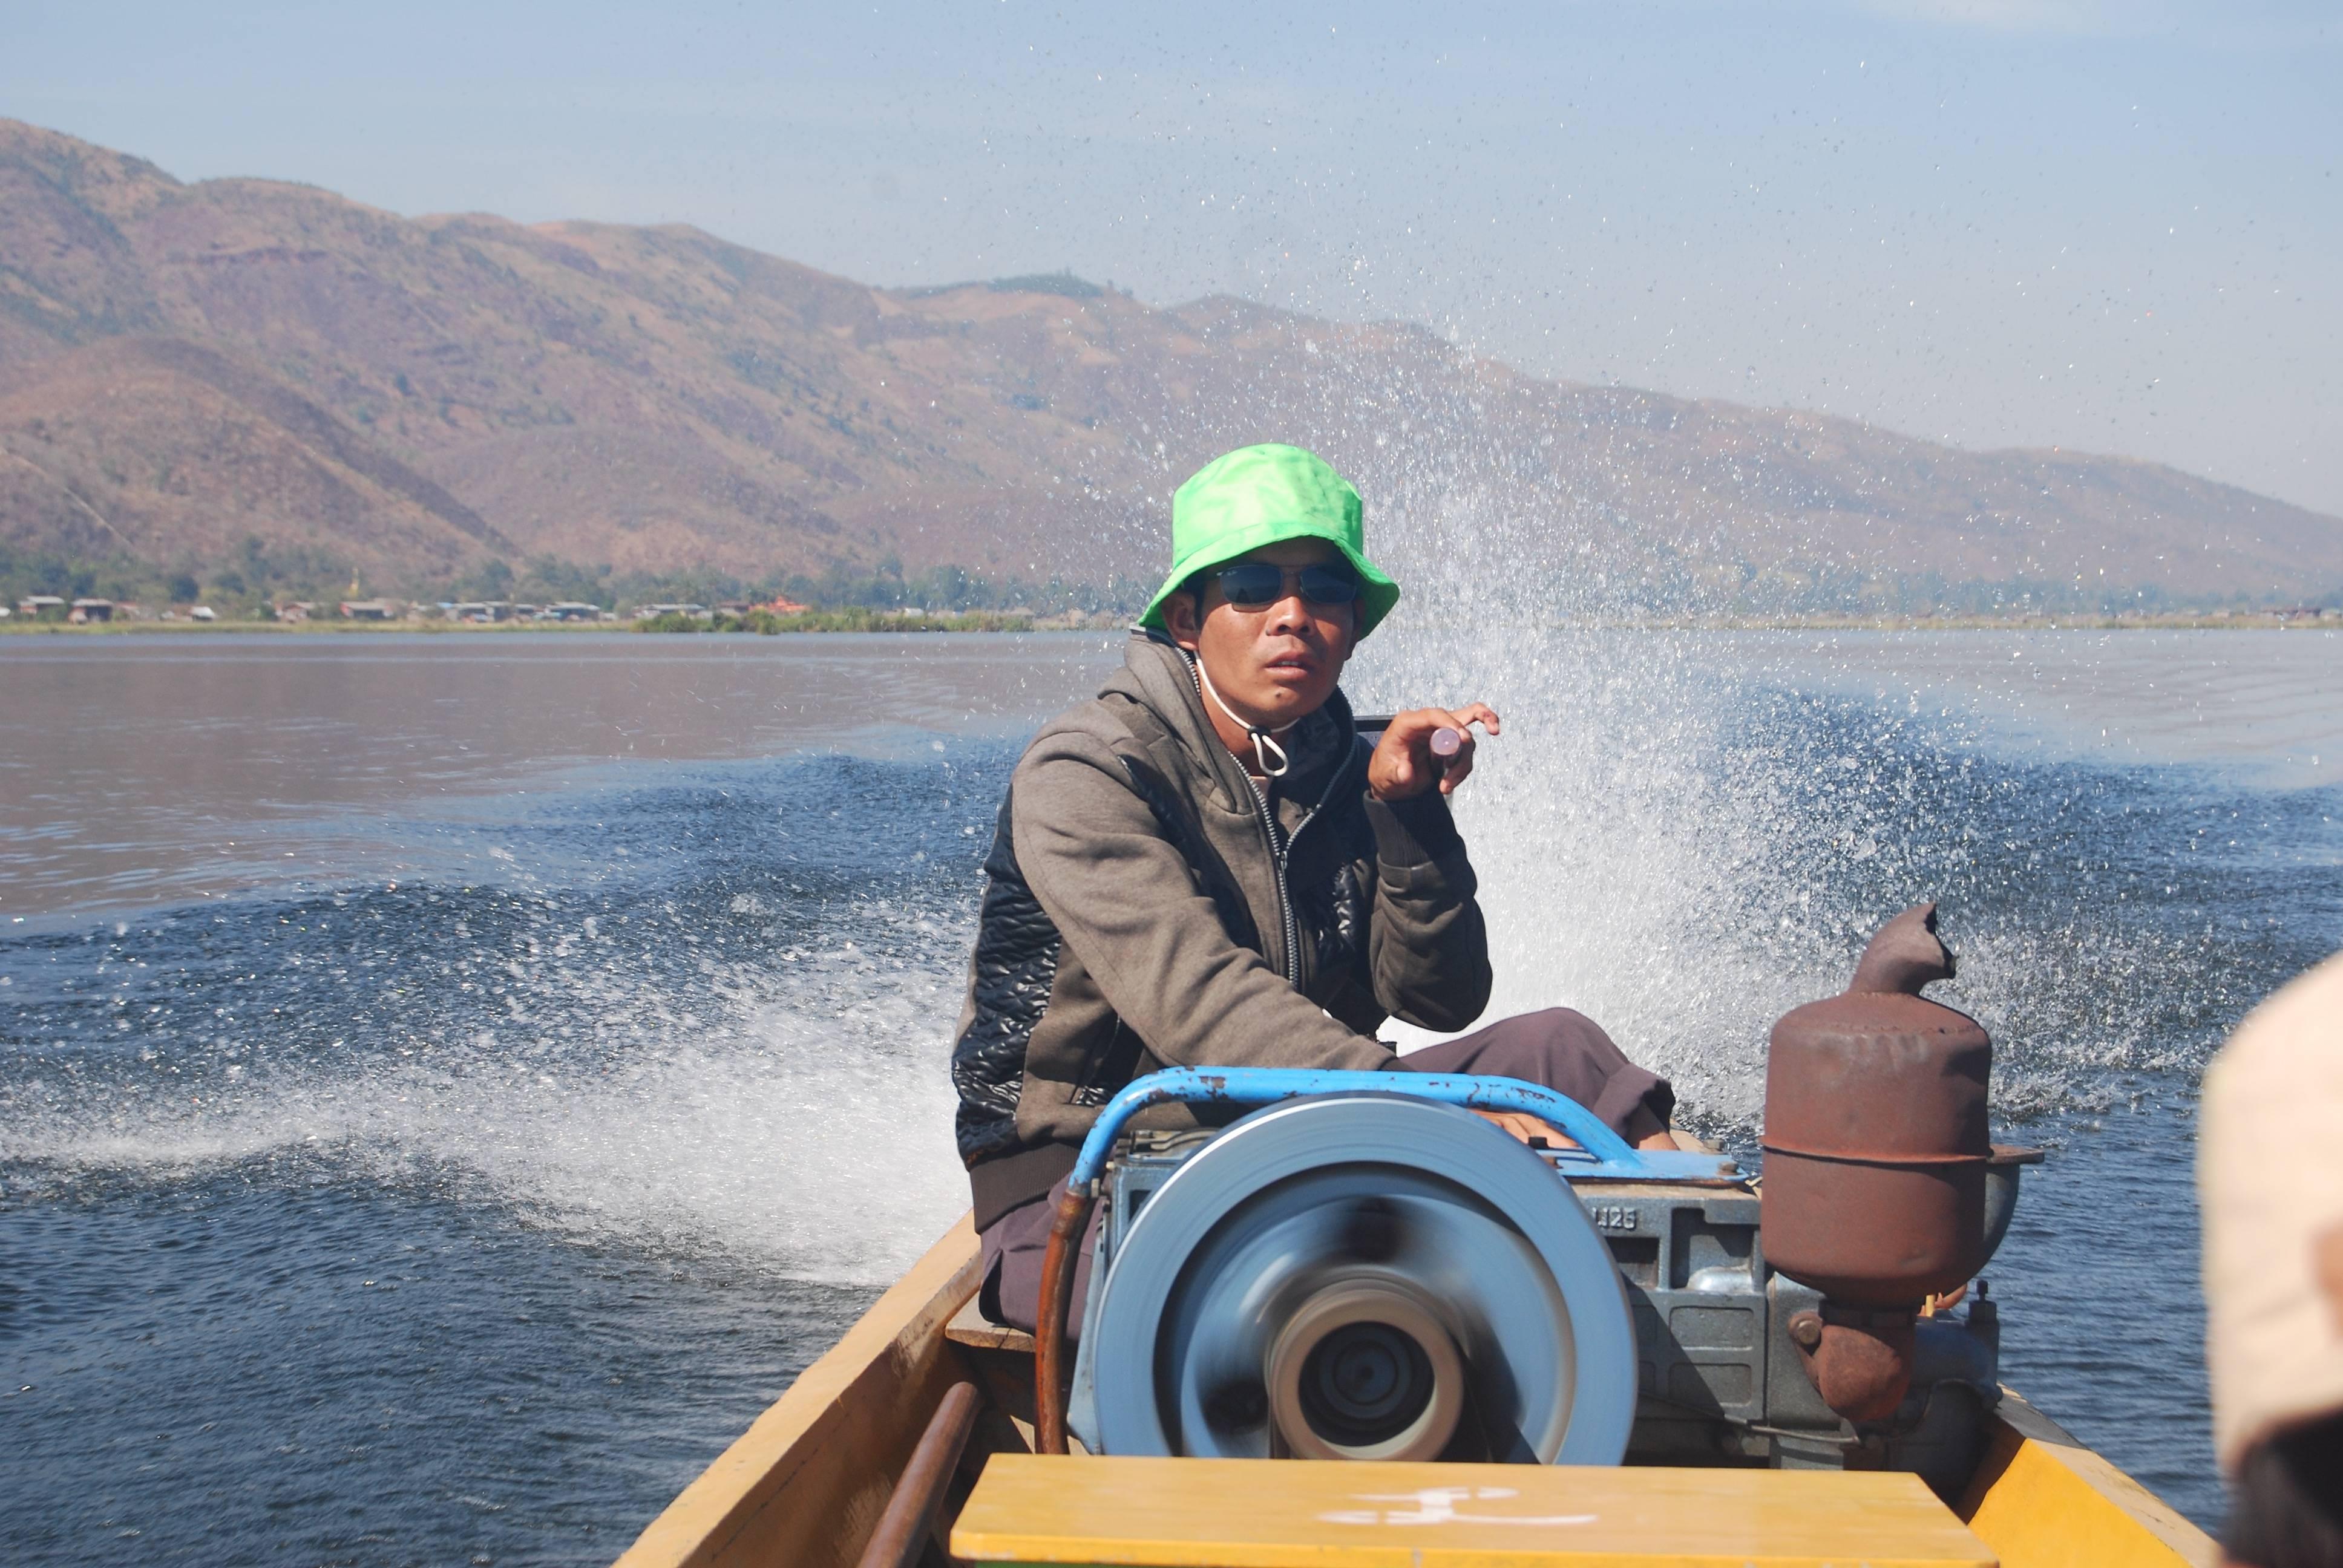 Båttur på Inle lake